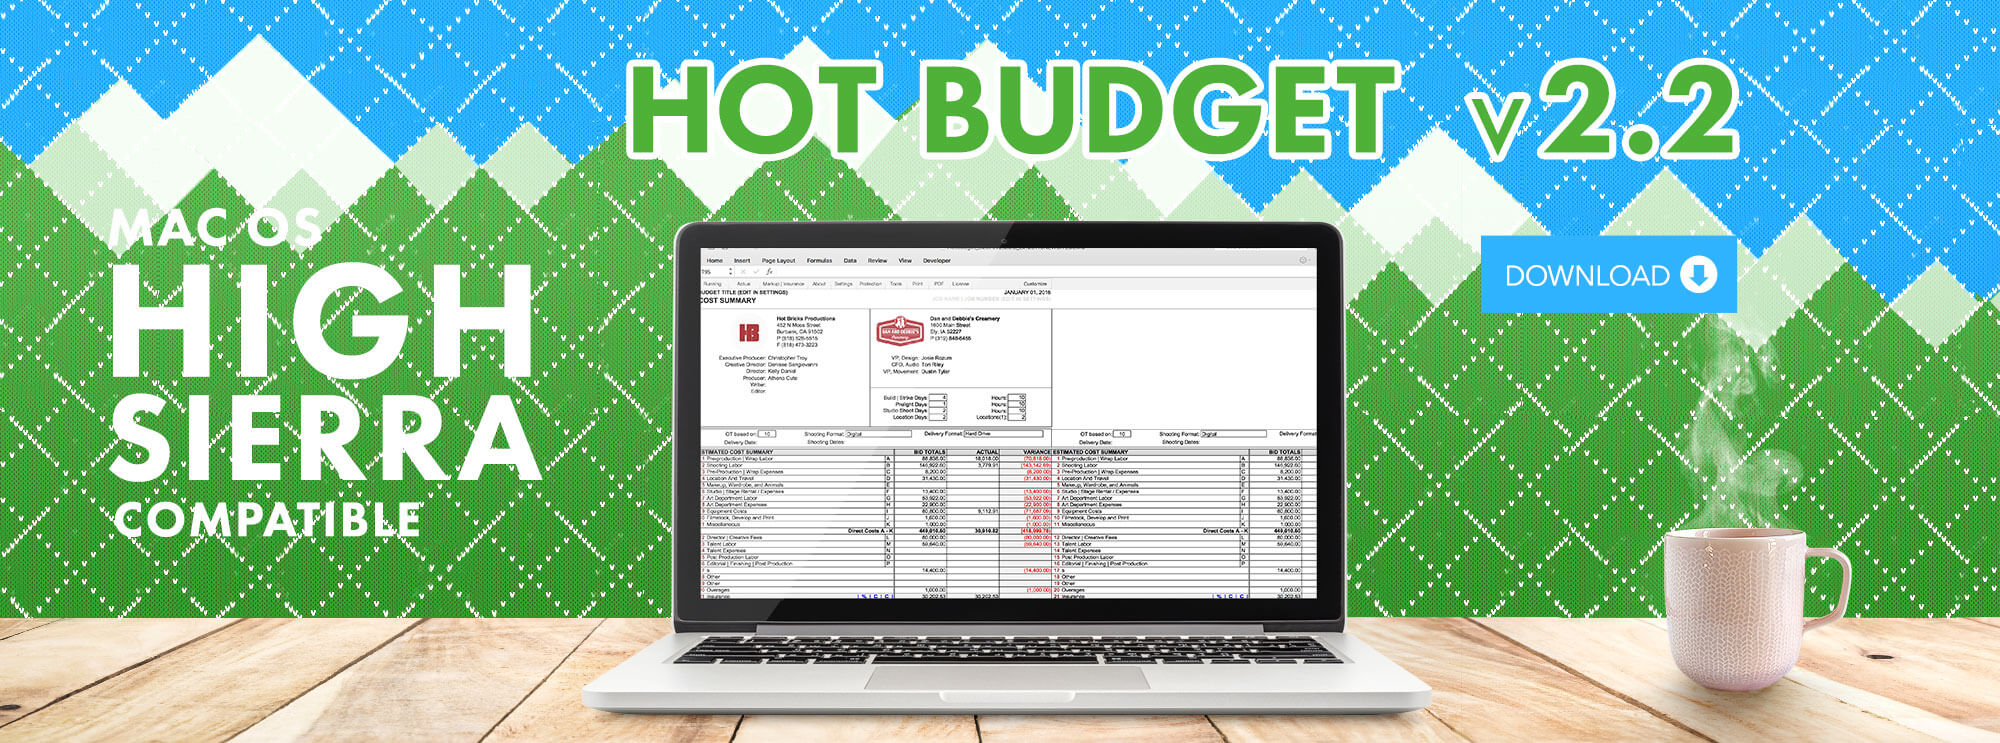 Hot Budget 2.2